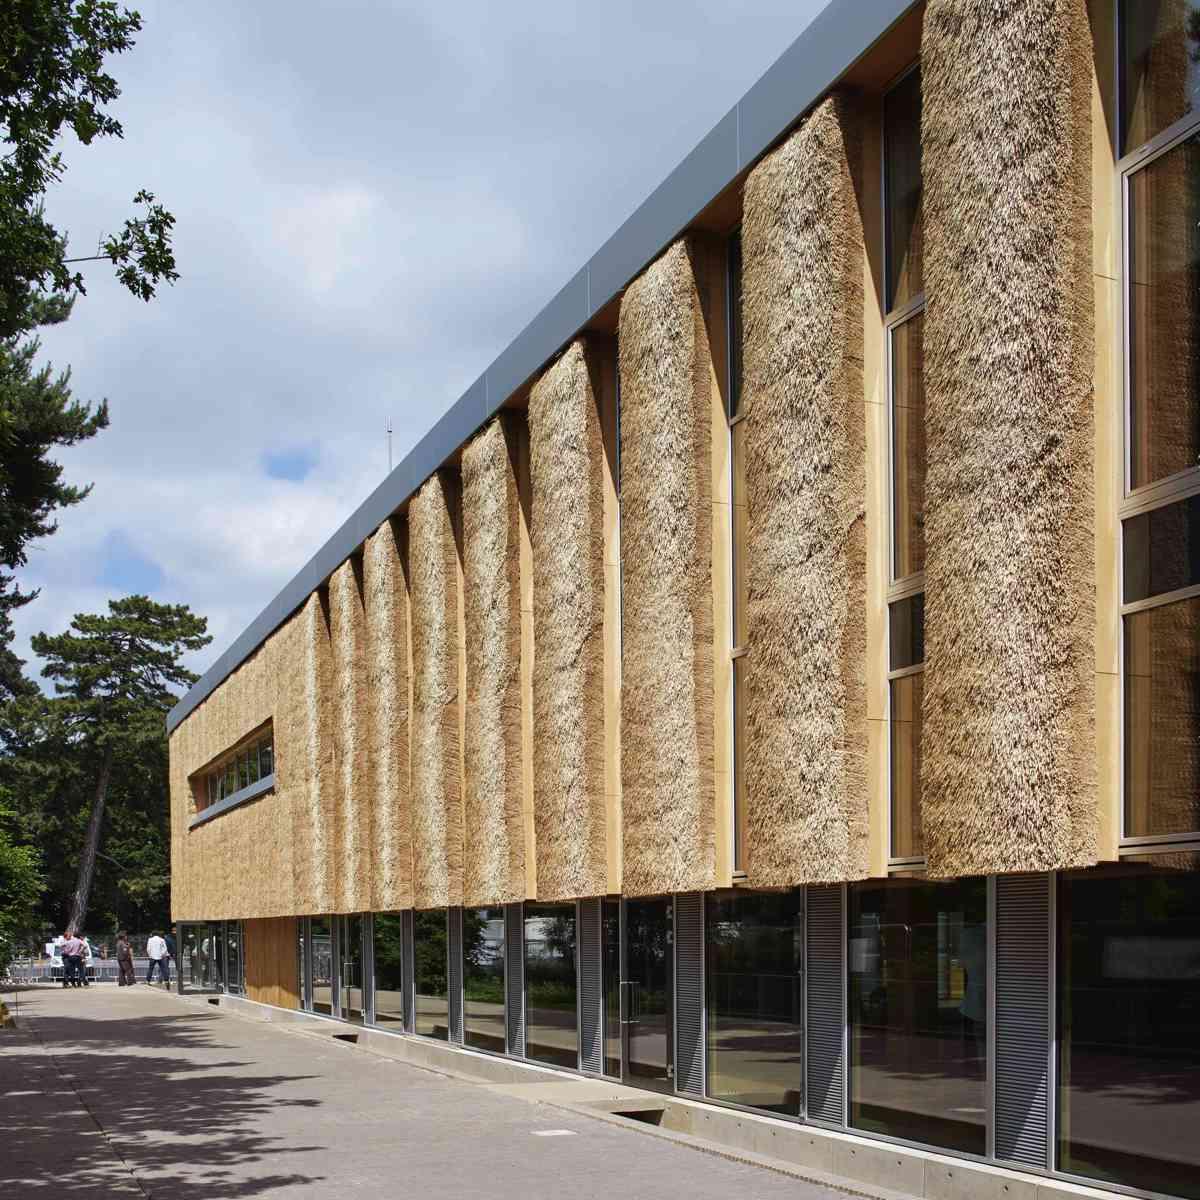 Enterprise Centre, made of thatch/ Architype architects/ Photo DennisGilbert/VIEW